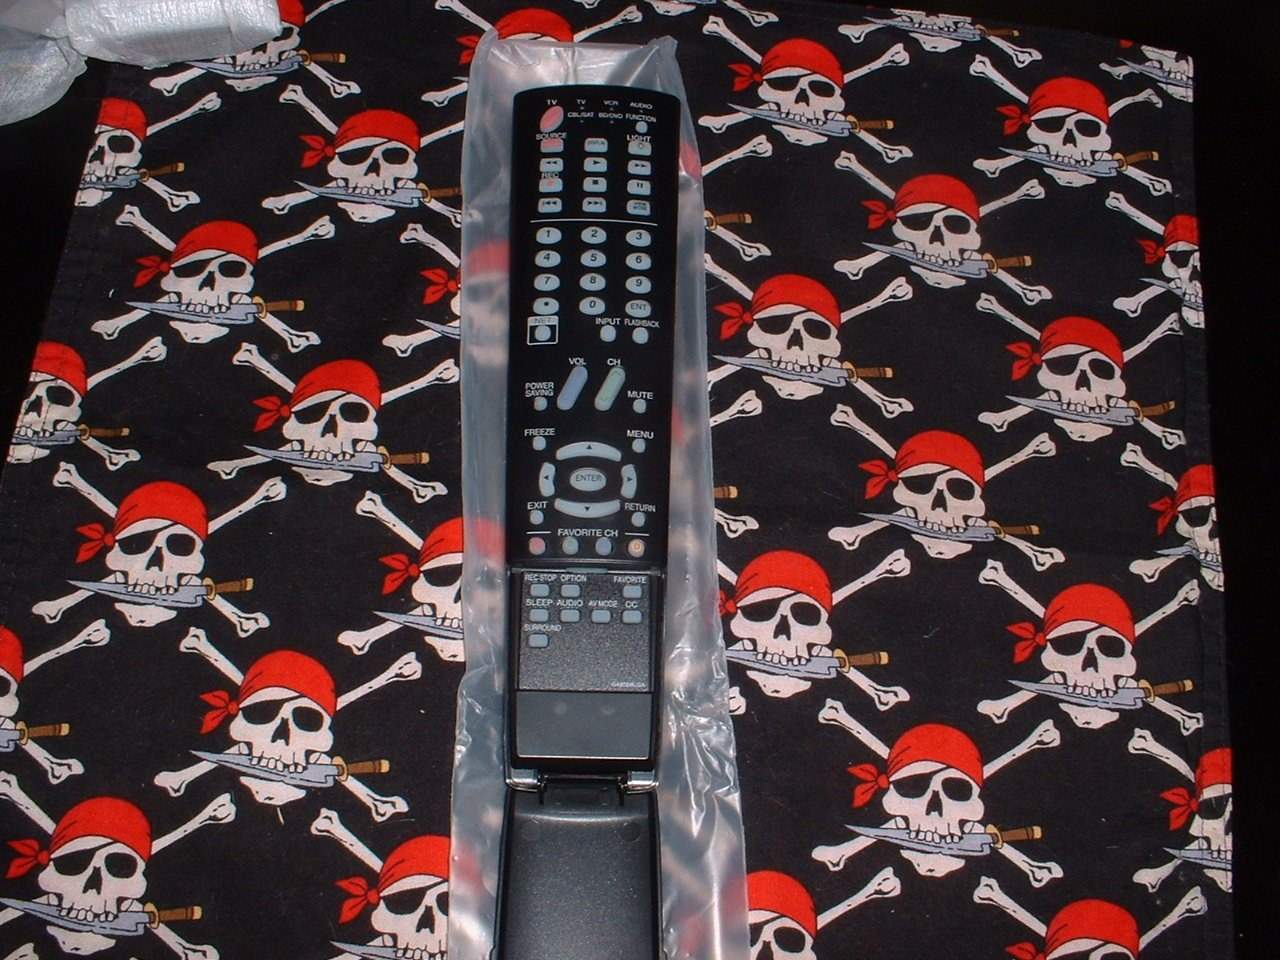 Sharp Aquos Lcd Tv Remote Control Ga806wjsa Ga840wjsa Remot Supplied With Models Lc 40le700 46le700 52le700 40le810 40le820 46le810